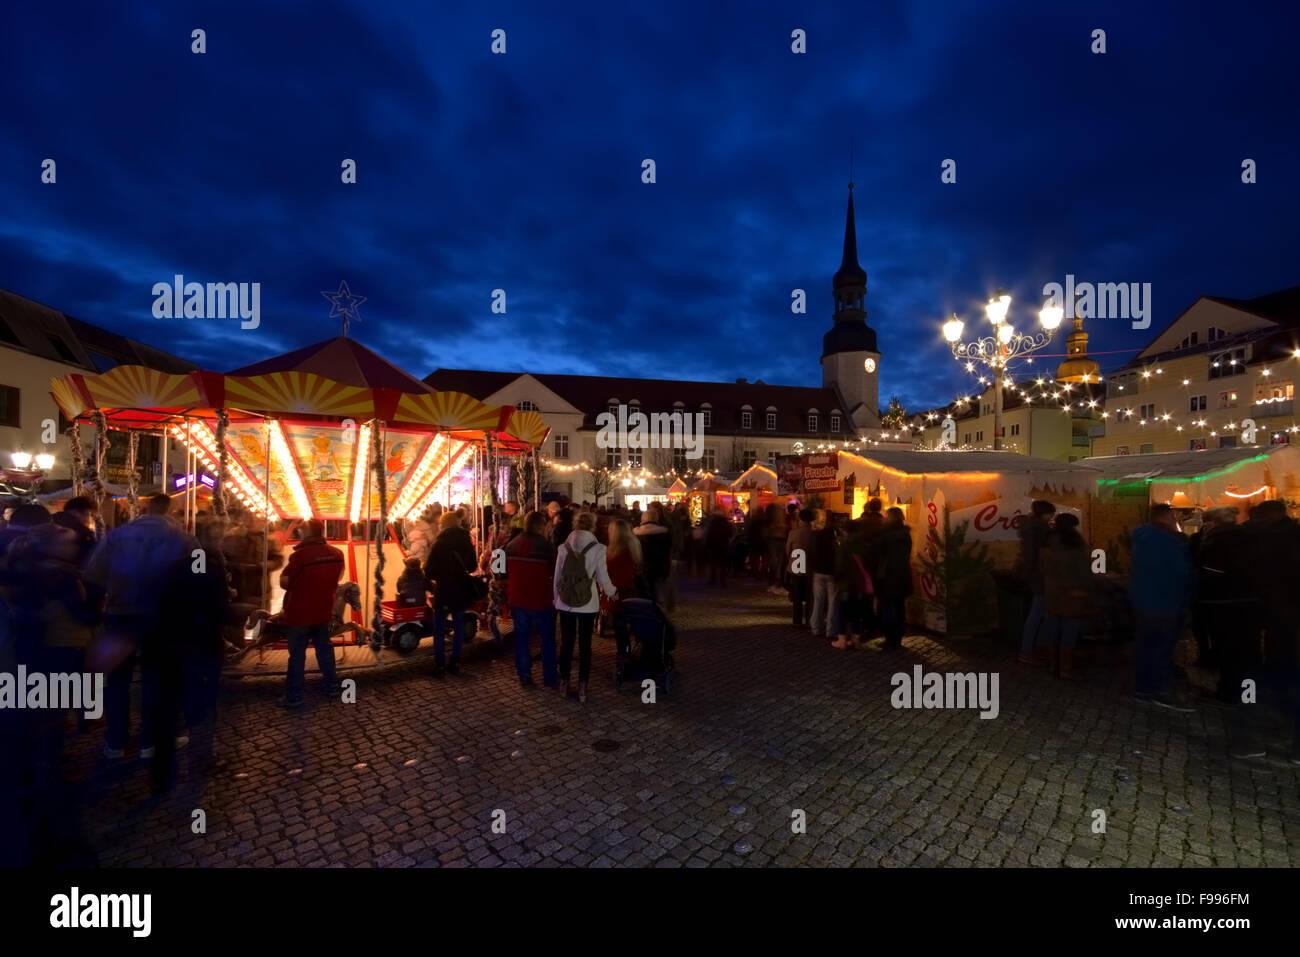 Spremberg Weihnachtsmarkt - Spremberg christmas market 06 - Stock Image